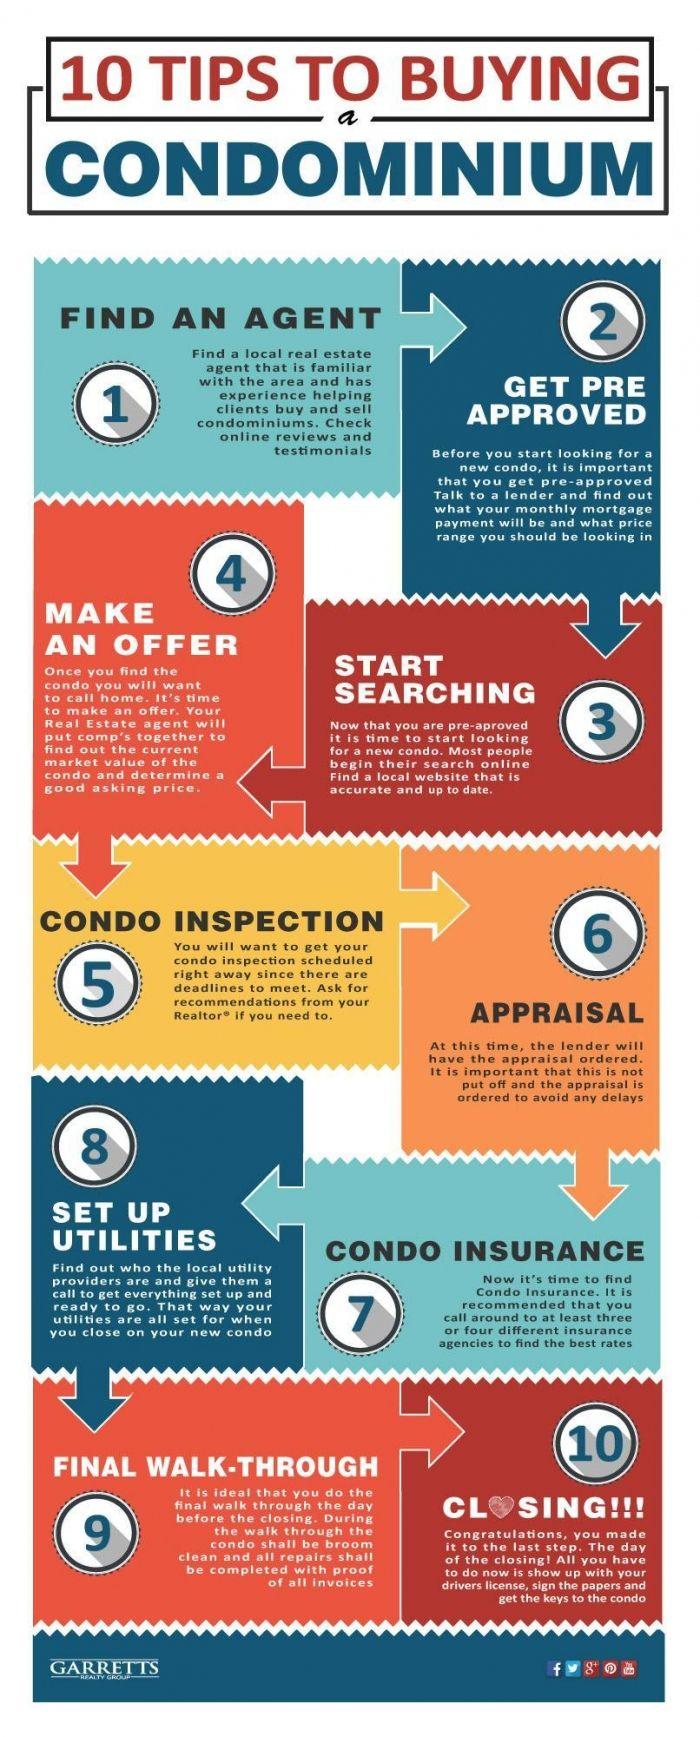 10 Tips To Buying A Condominium Buying A Condo